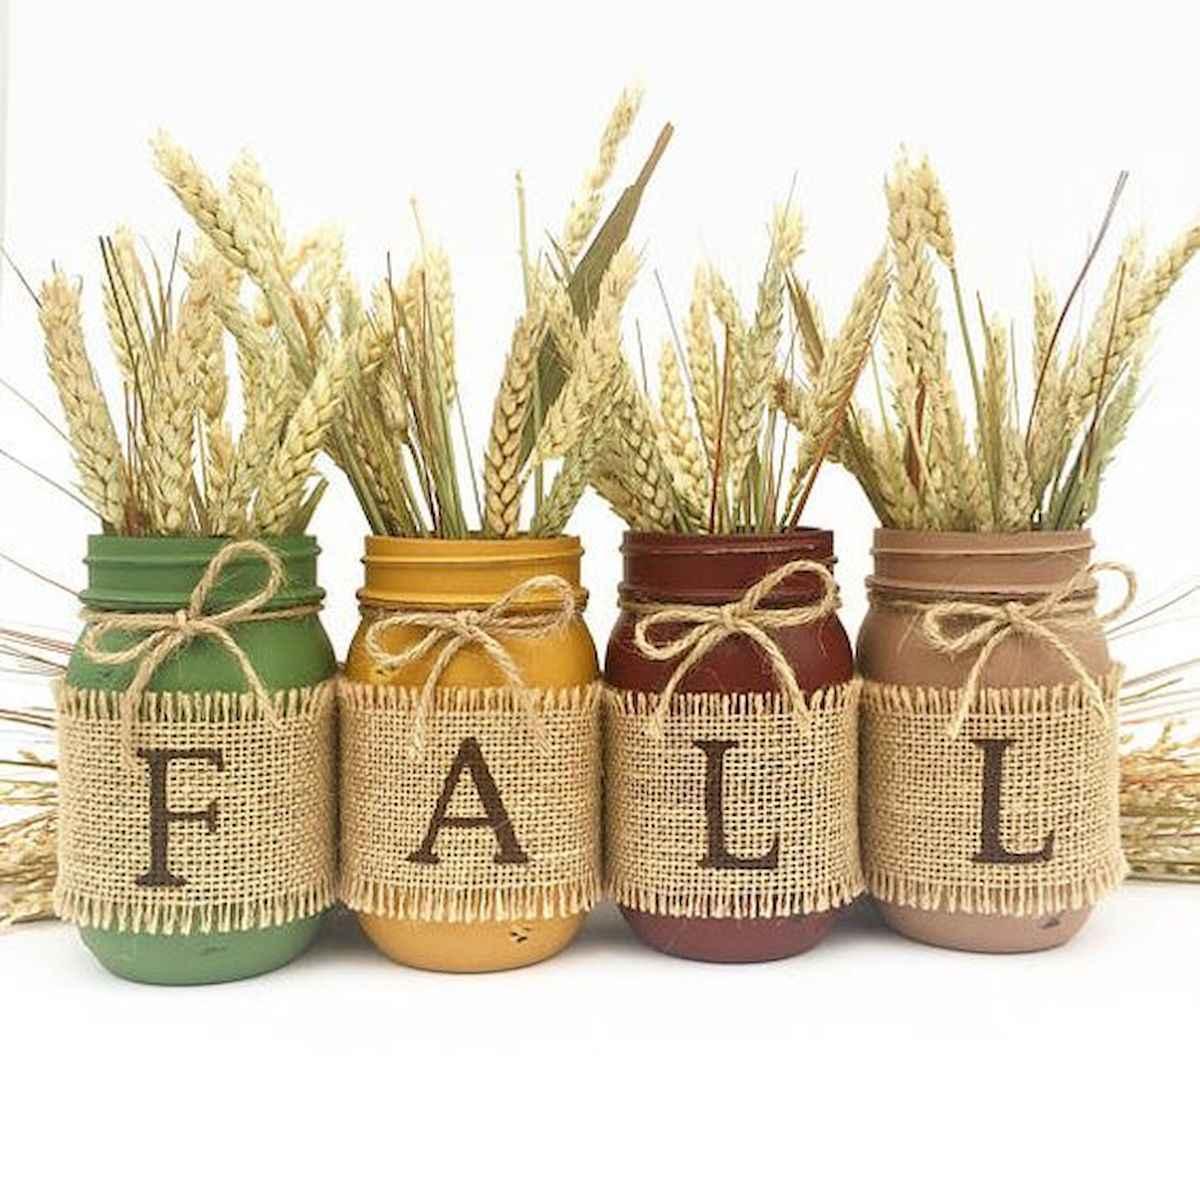 30 Best Creative DIY Mason Jar Halloween Crafts to Spice Up Your Fall Decor (4)